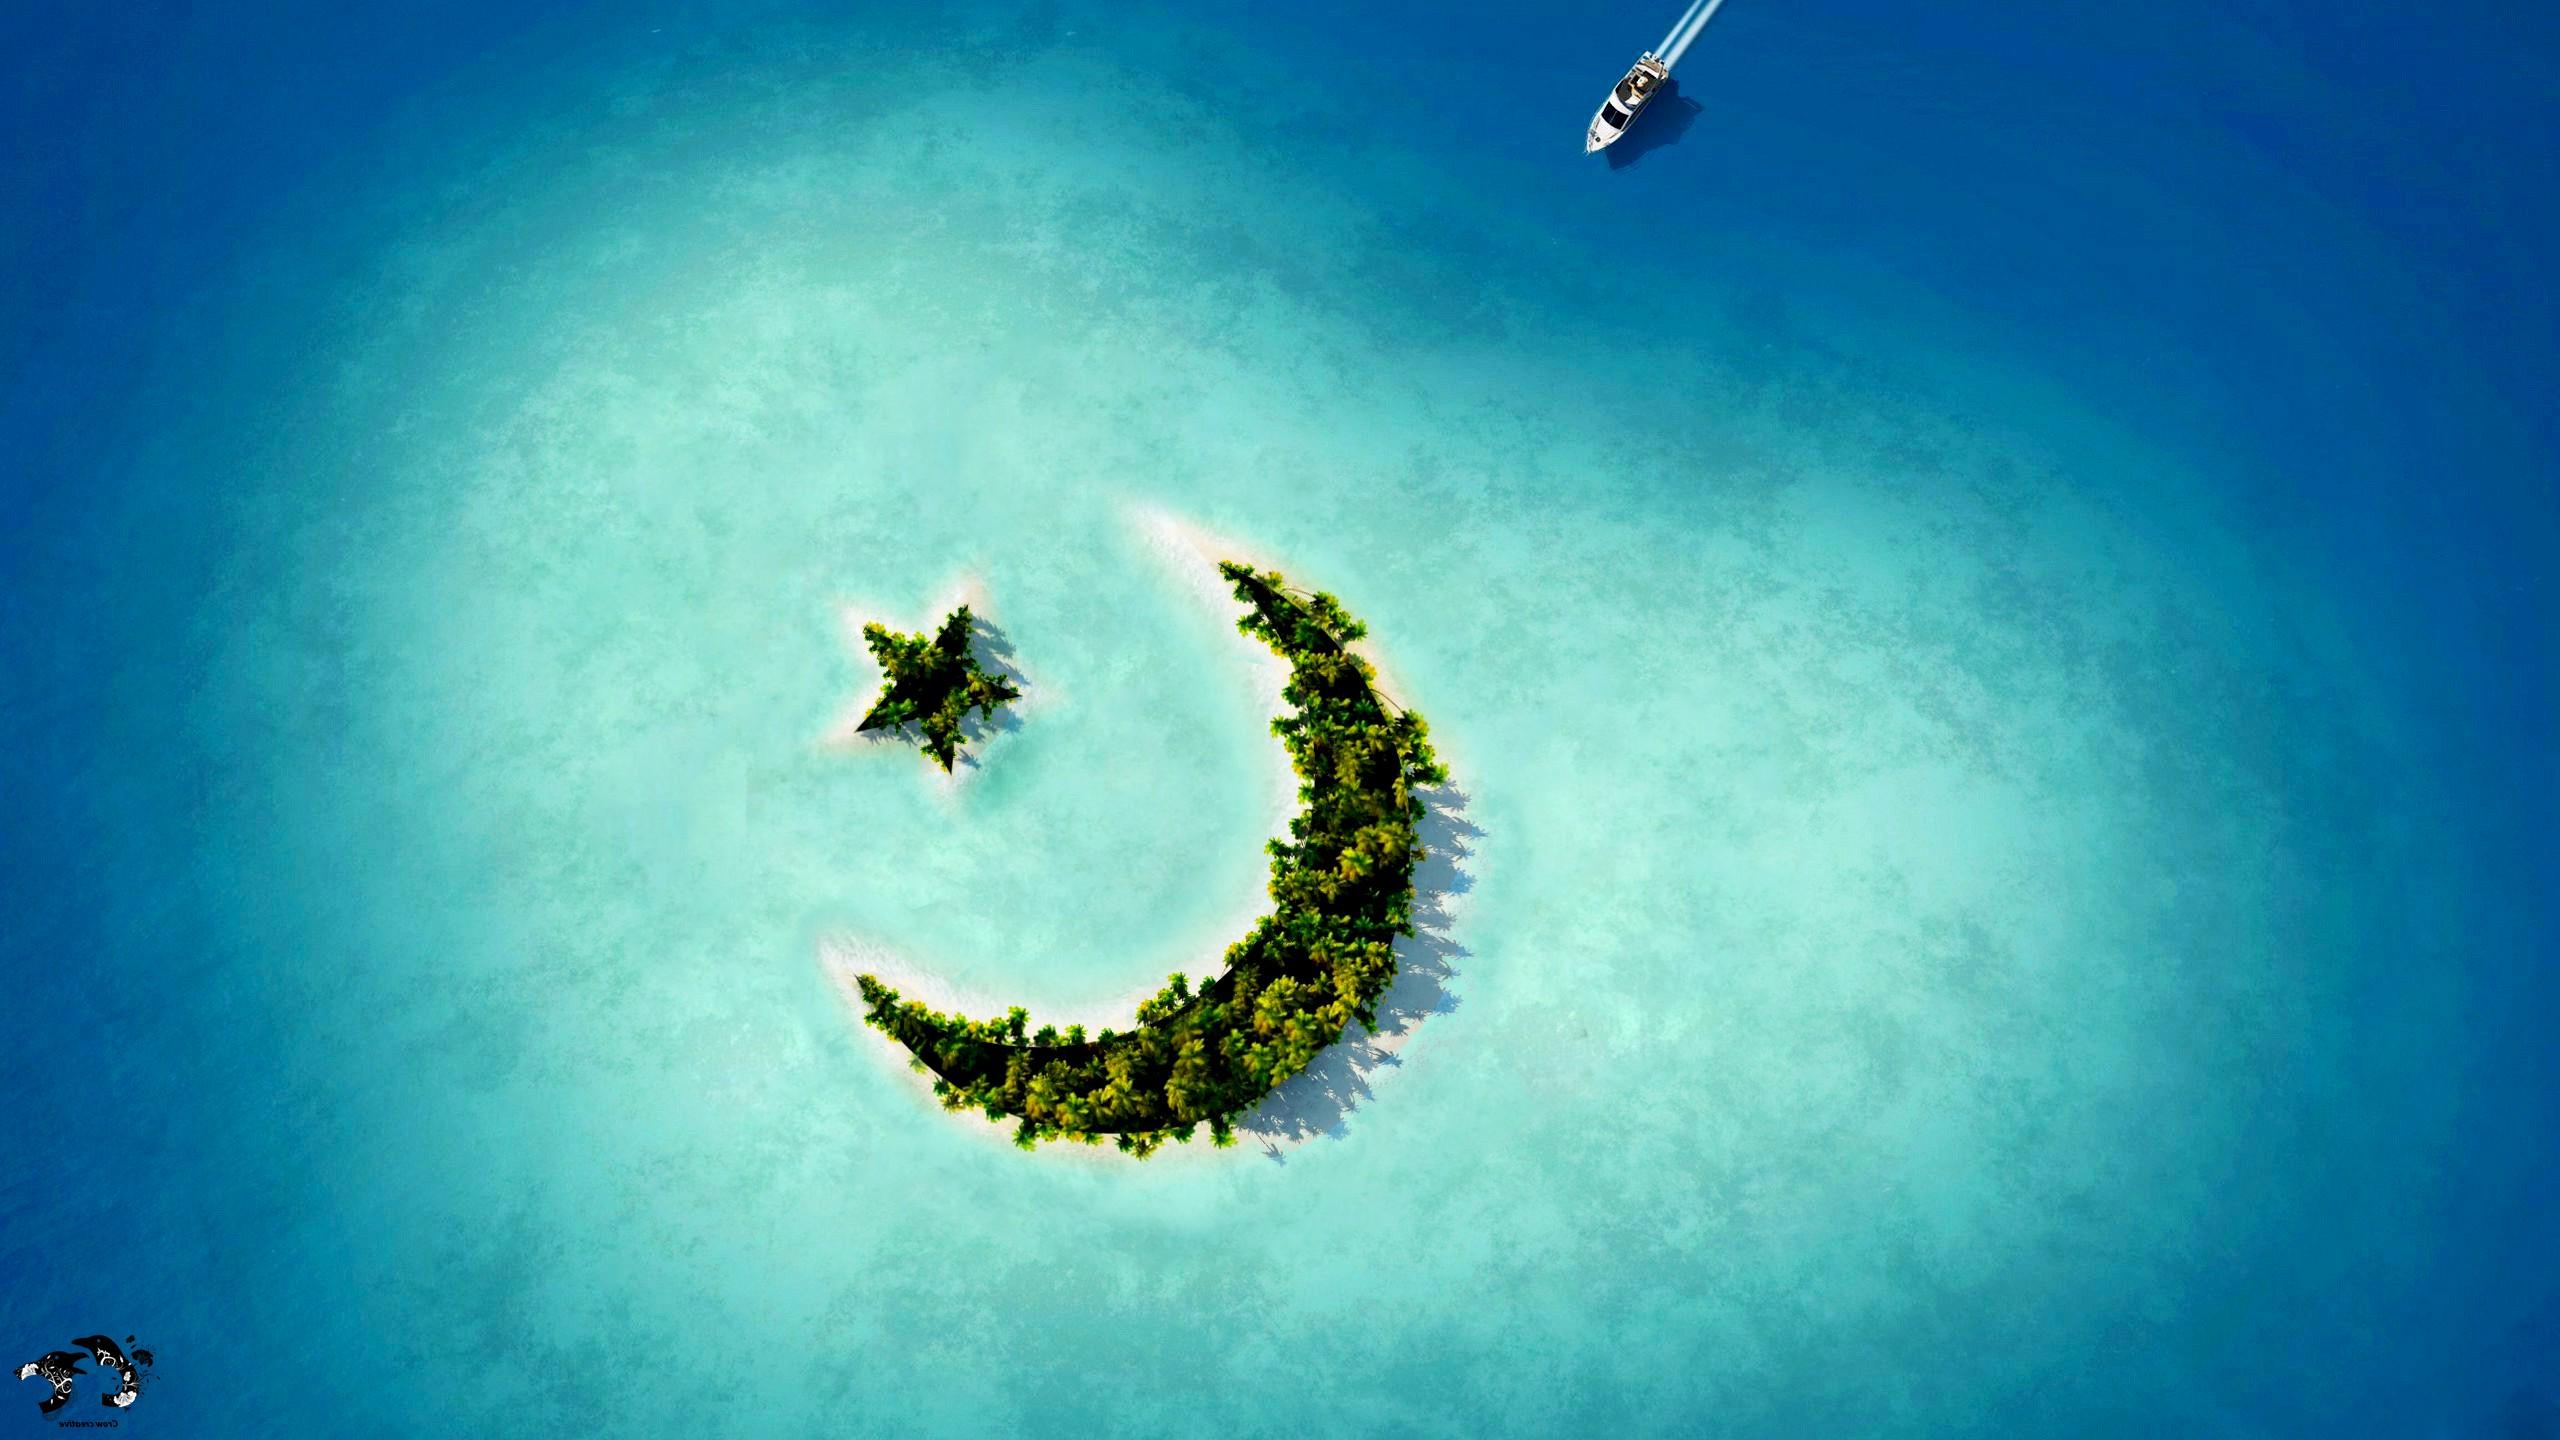 3d Wallpaper Anime Crescent Moon Star Island Hd Nature 4k Wallpapers